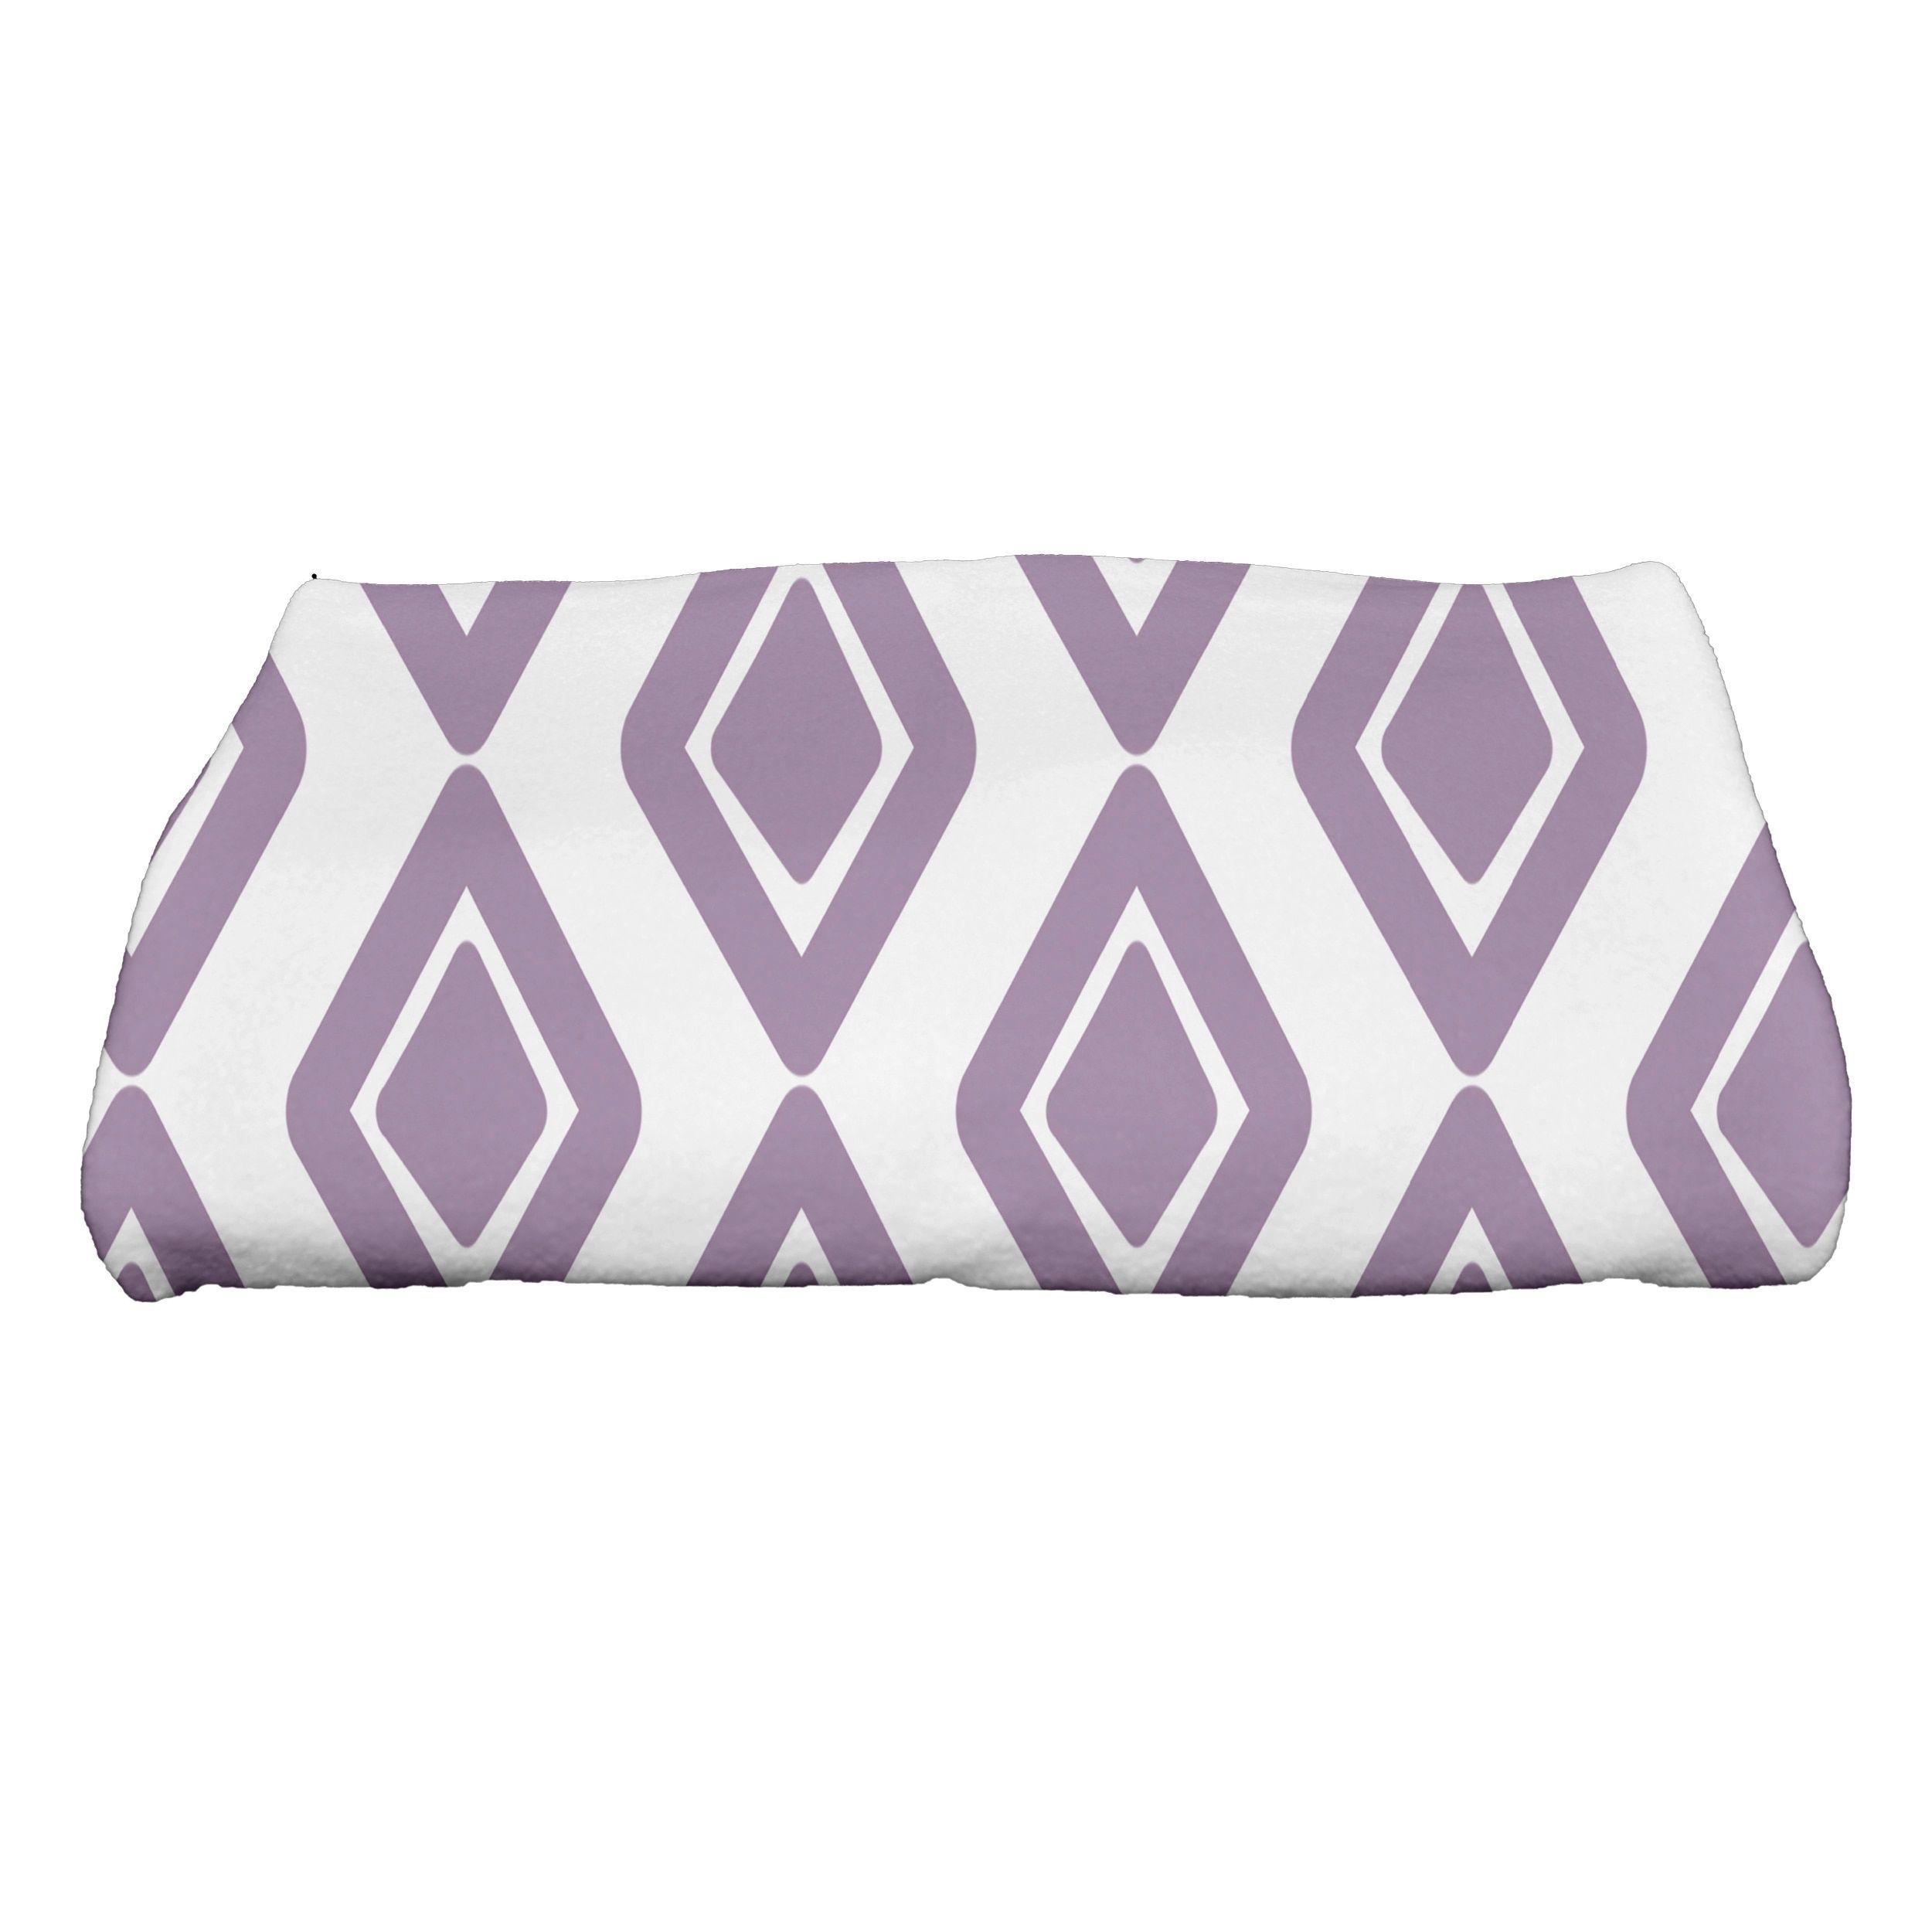 E by Design 28 x 58-inch, Diamond Jive 1, Print Bath Towel